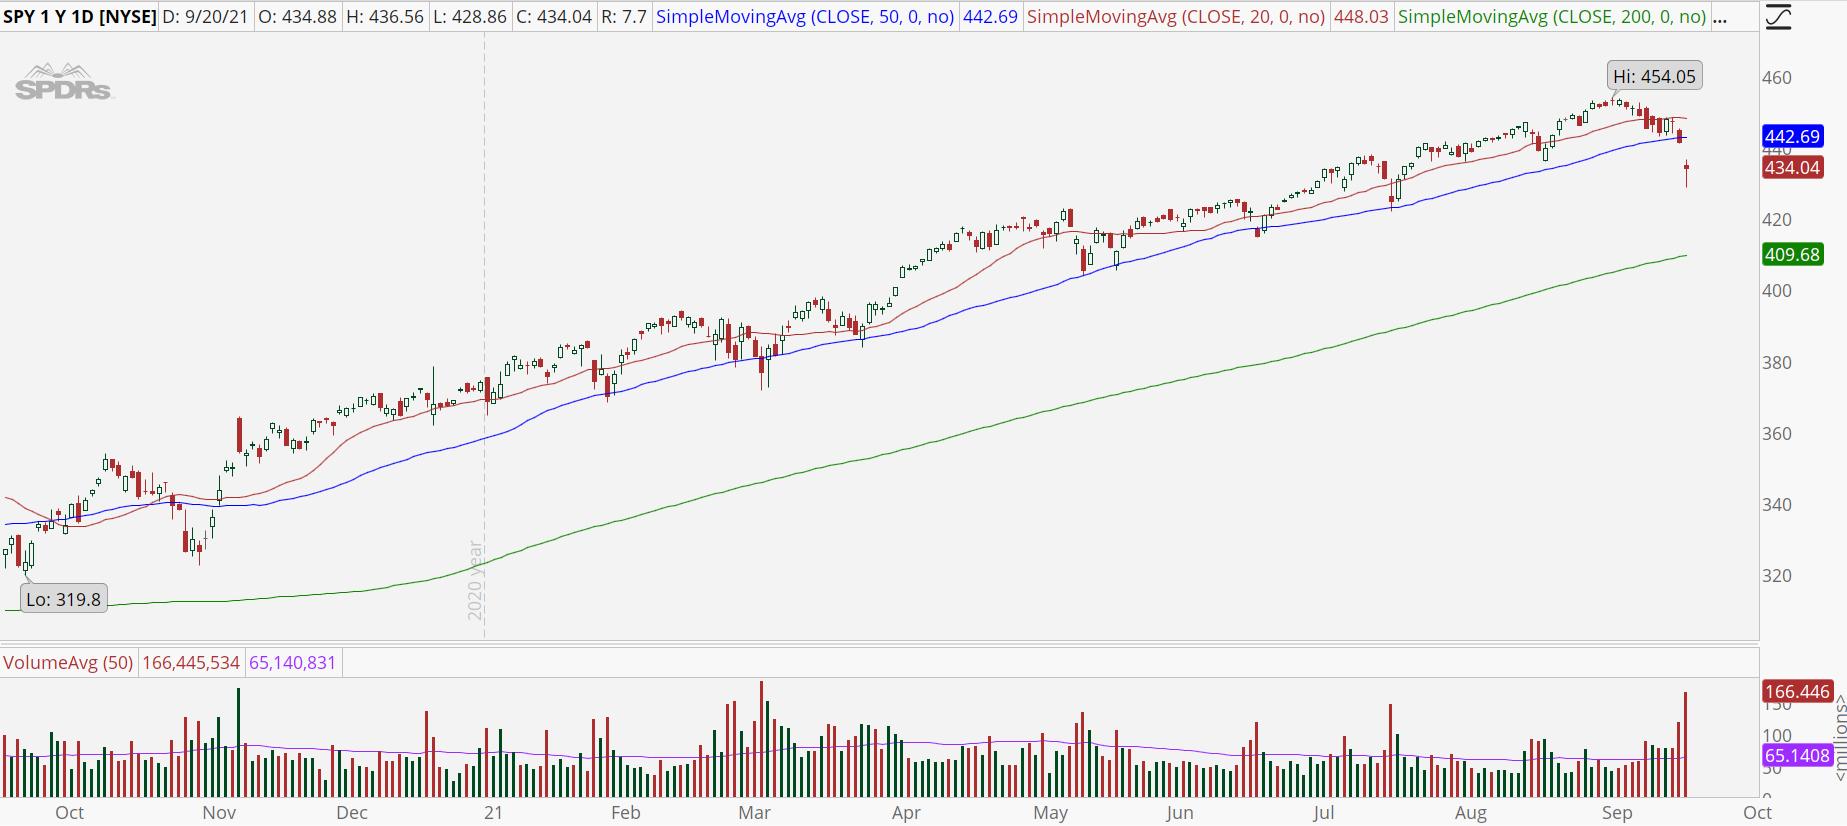 S&P 500 ETF (SPY) with major support break